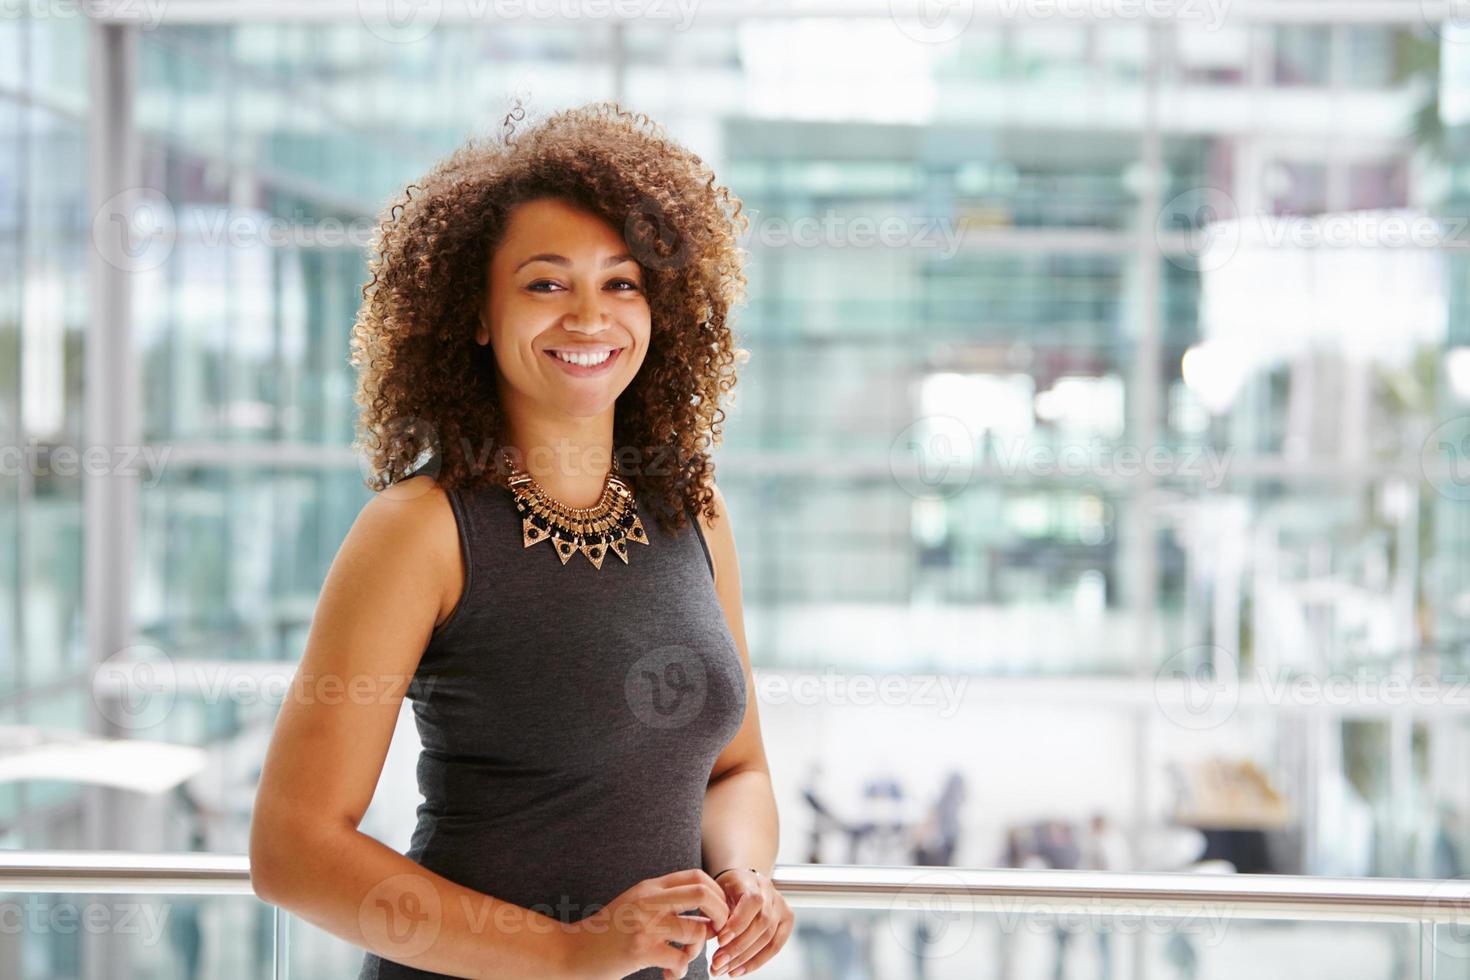 African American businesswoman smiling portrait, waist up photo